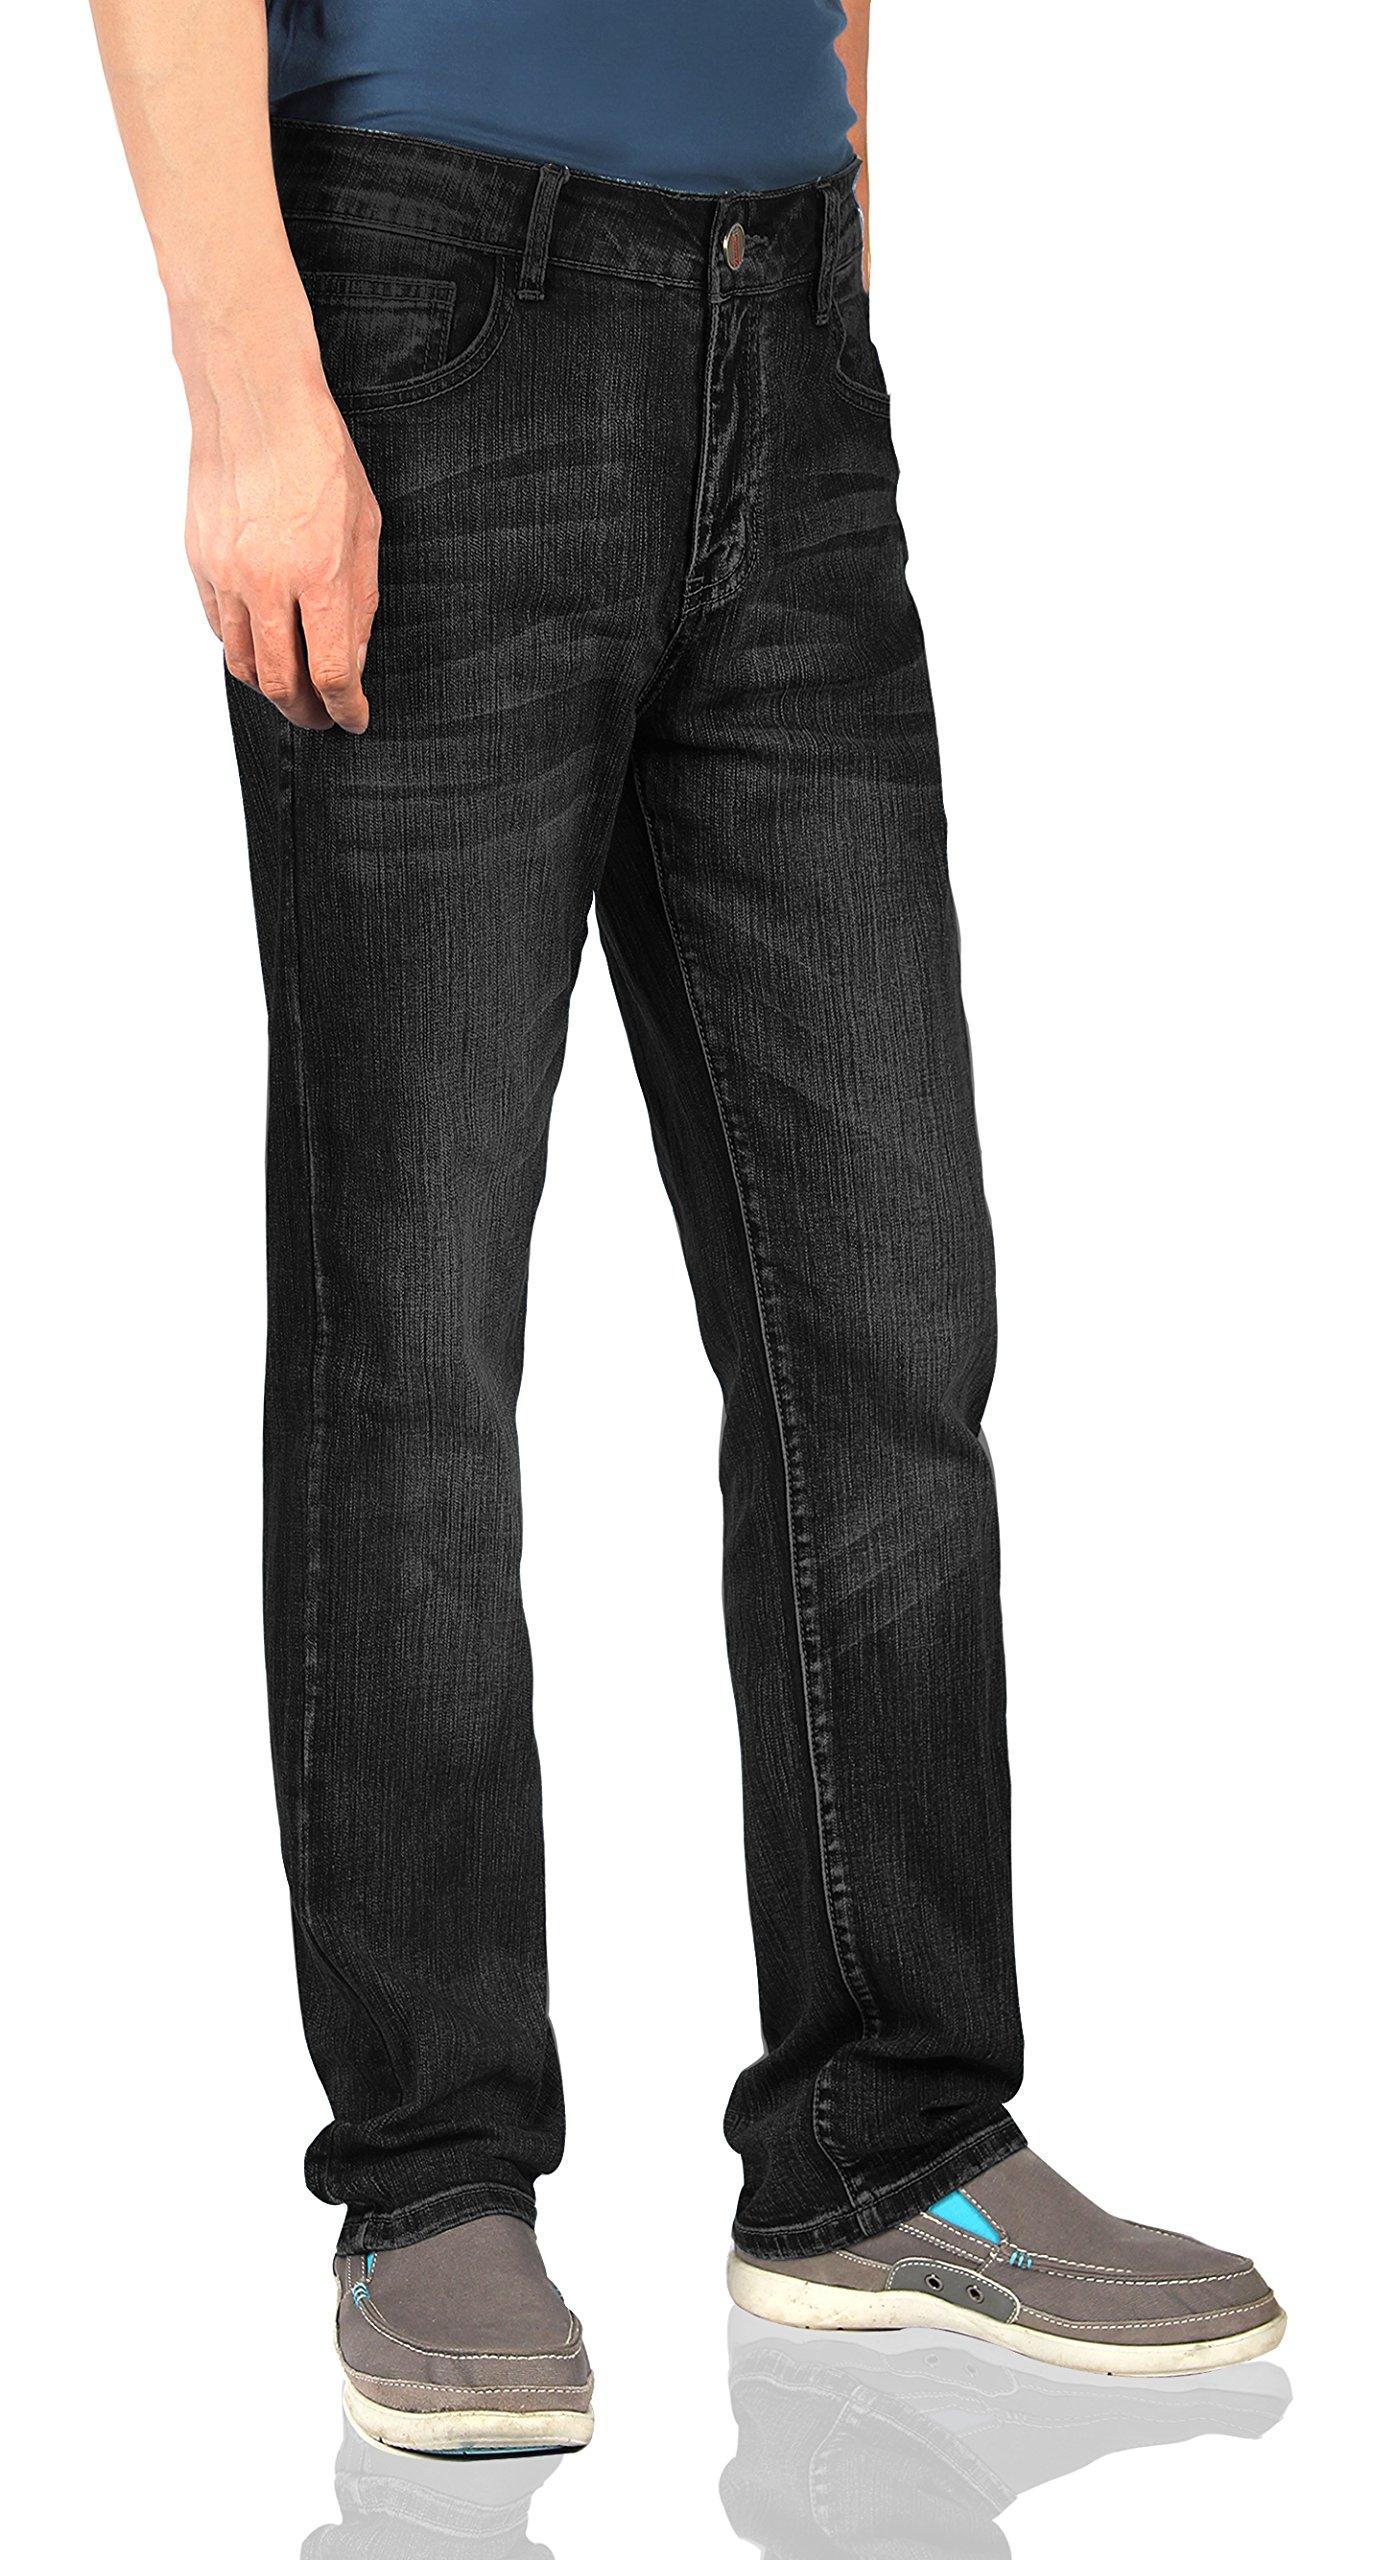 iLoveSIA Men's Jeans Straight Leg Classic Regular Fit Size 38 x 32L Black Stonewash by iLoveSIA